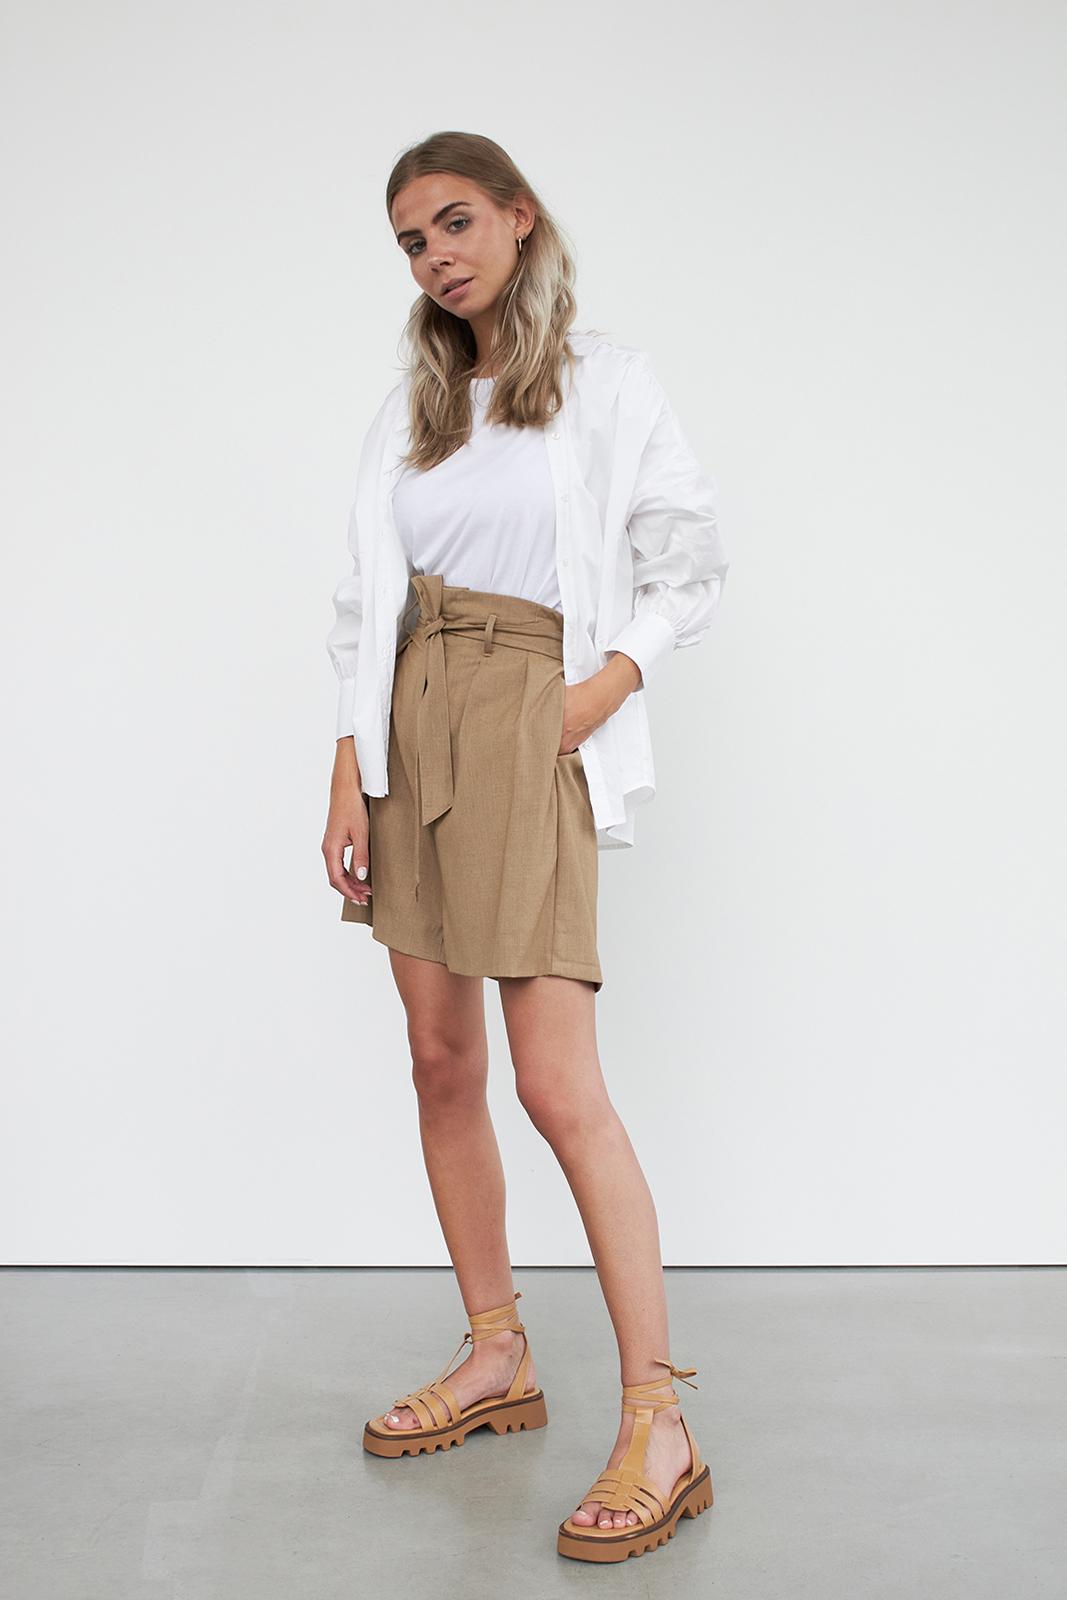 woman wearing shorts, shirt and t-shirt